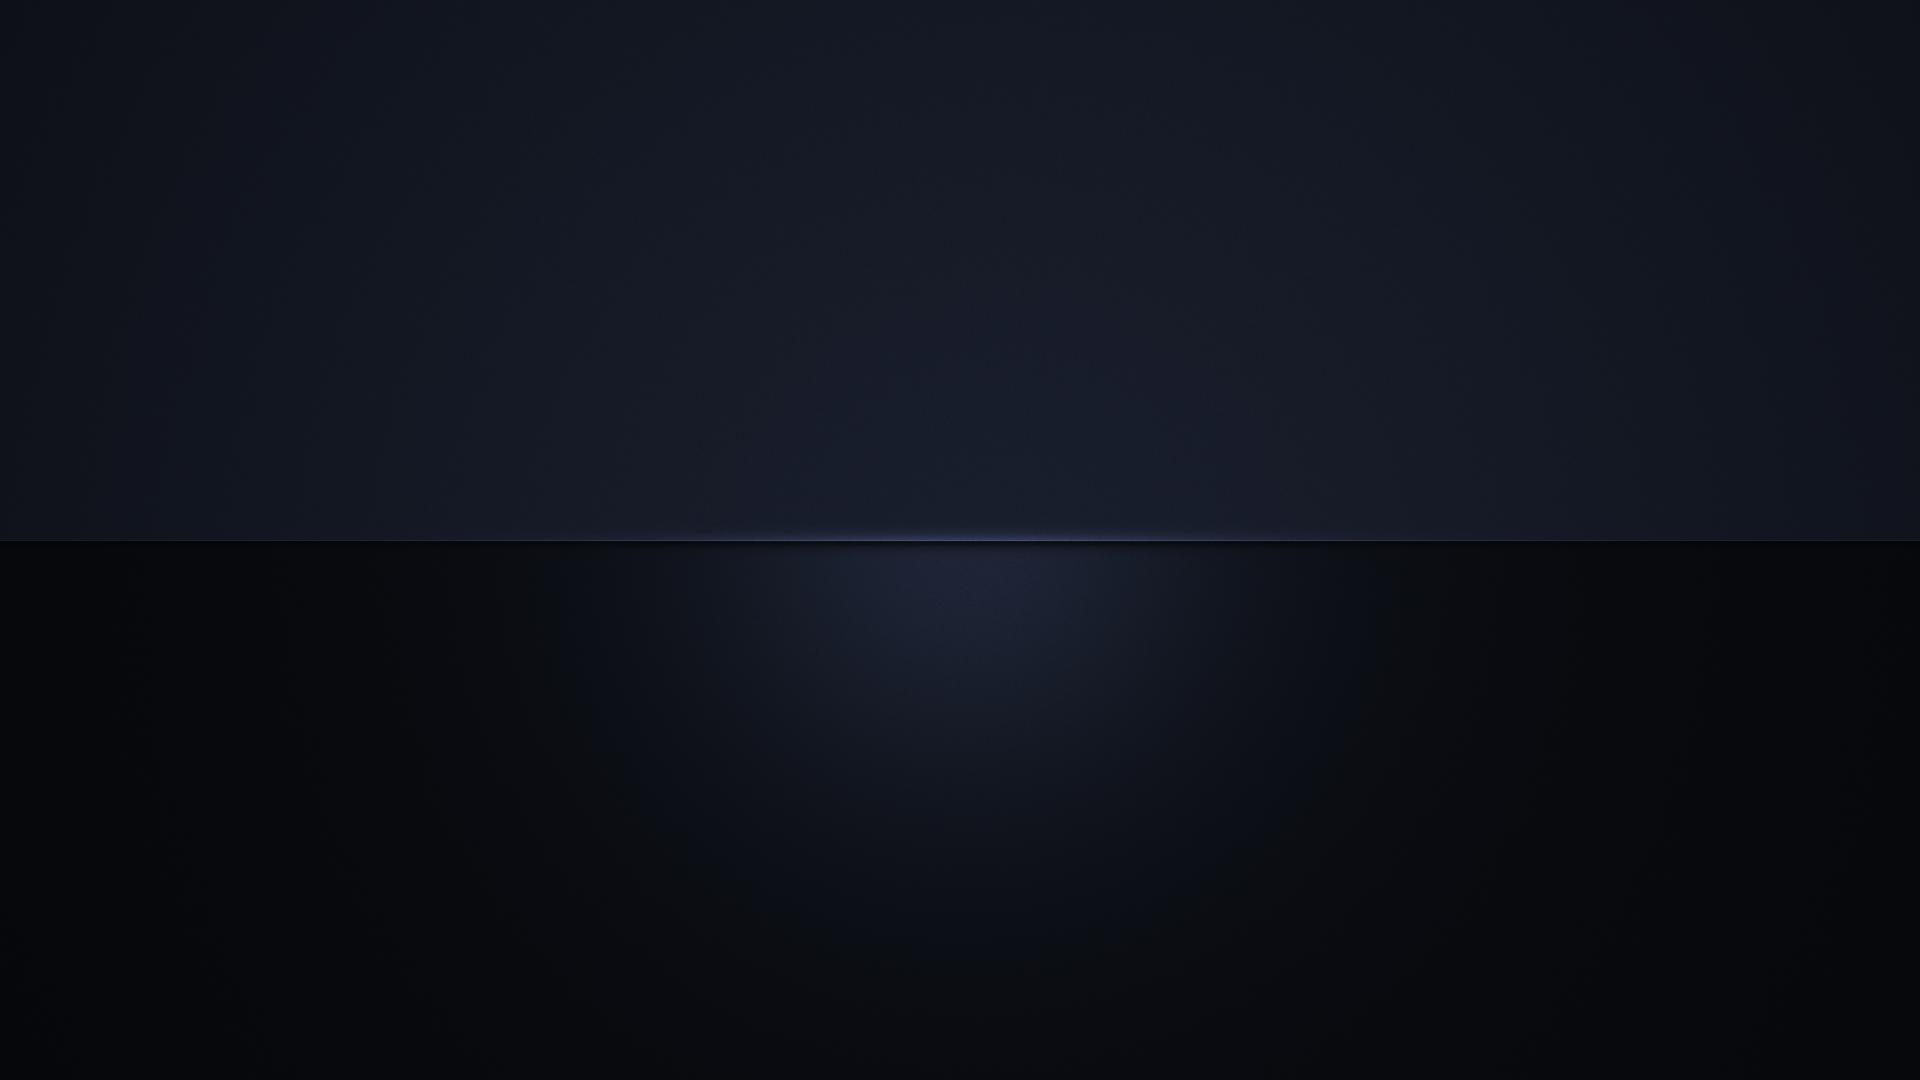 Download minimal black wallpaper HD wallpaper 1920x1080